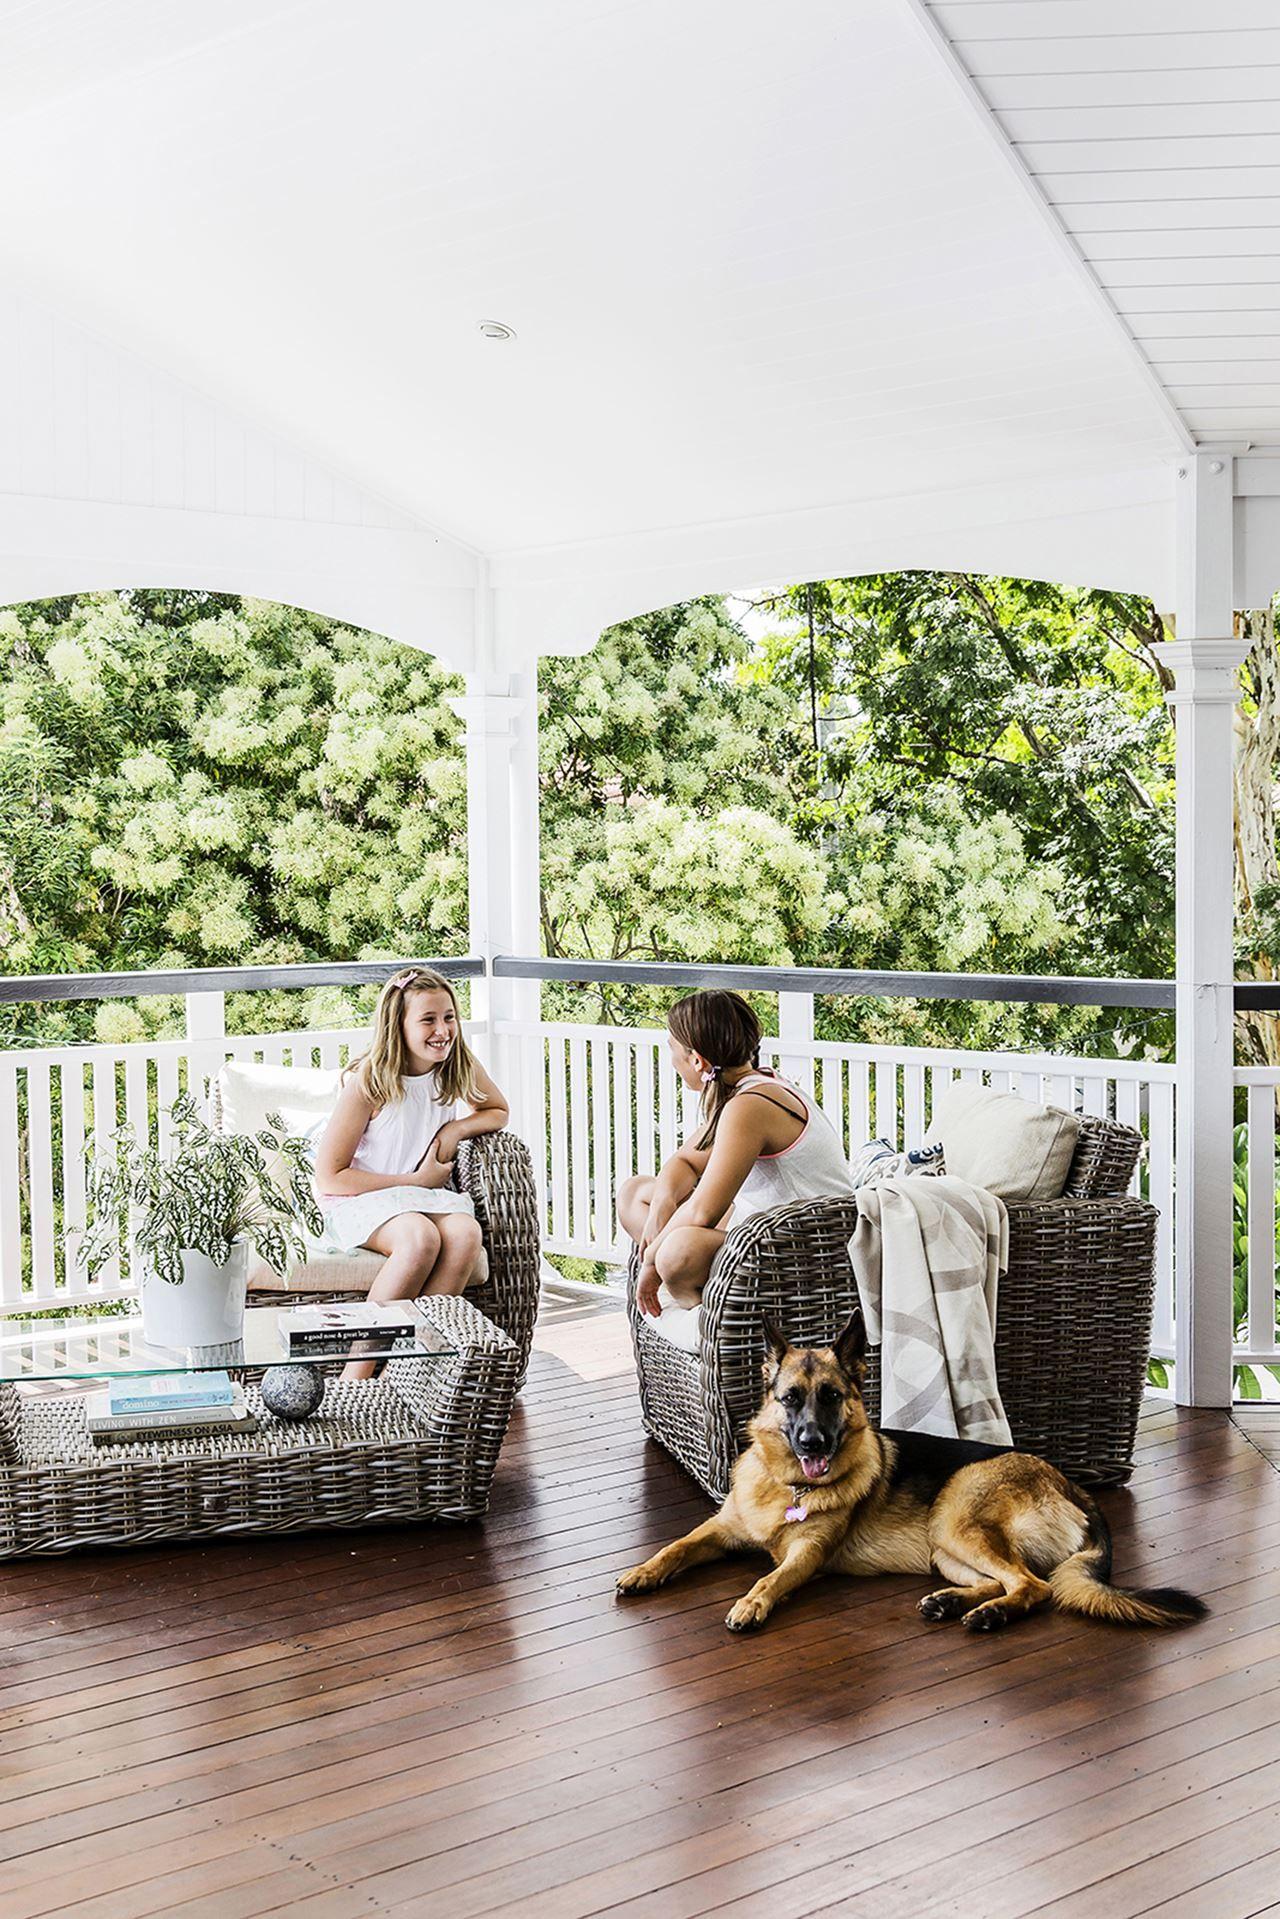 Queenslander Large Veranda With Timber Decking Vaulted